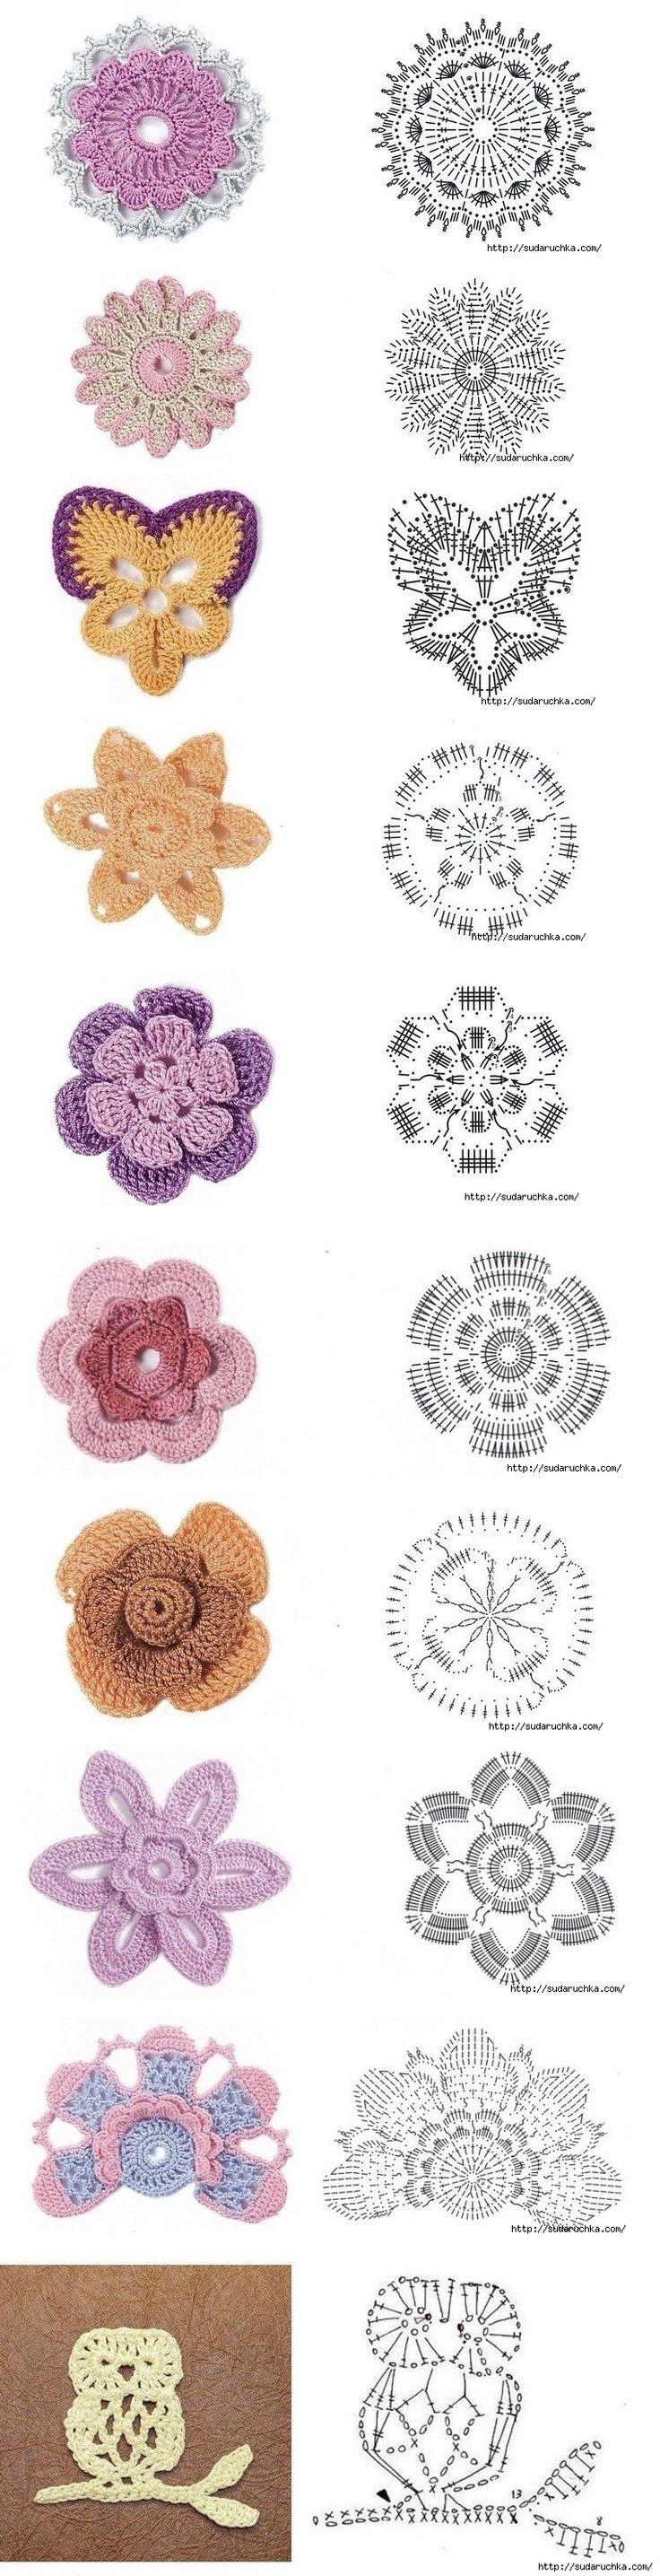 201 mejores im genes sobre flores crochet en pinterest - Dibujos de ganchillo ...